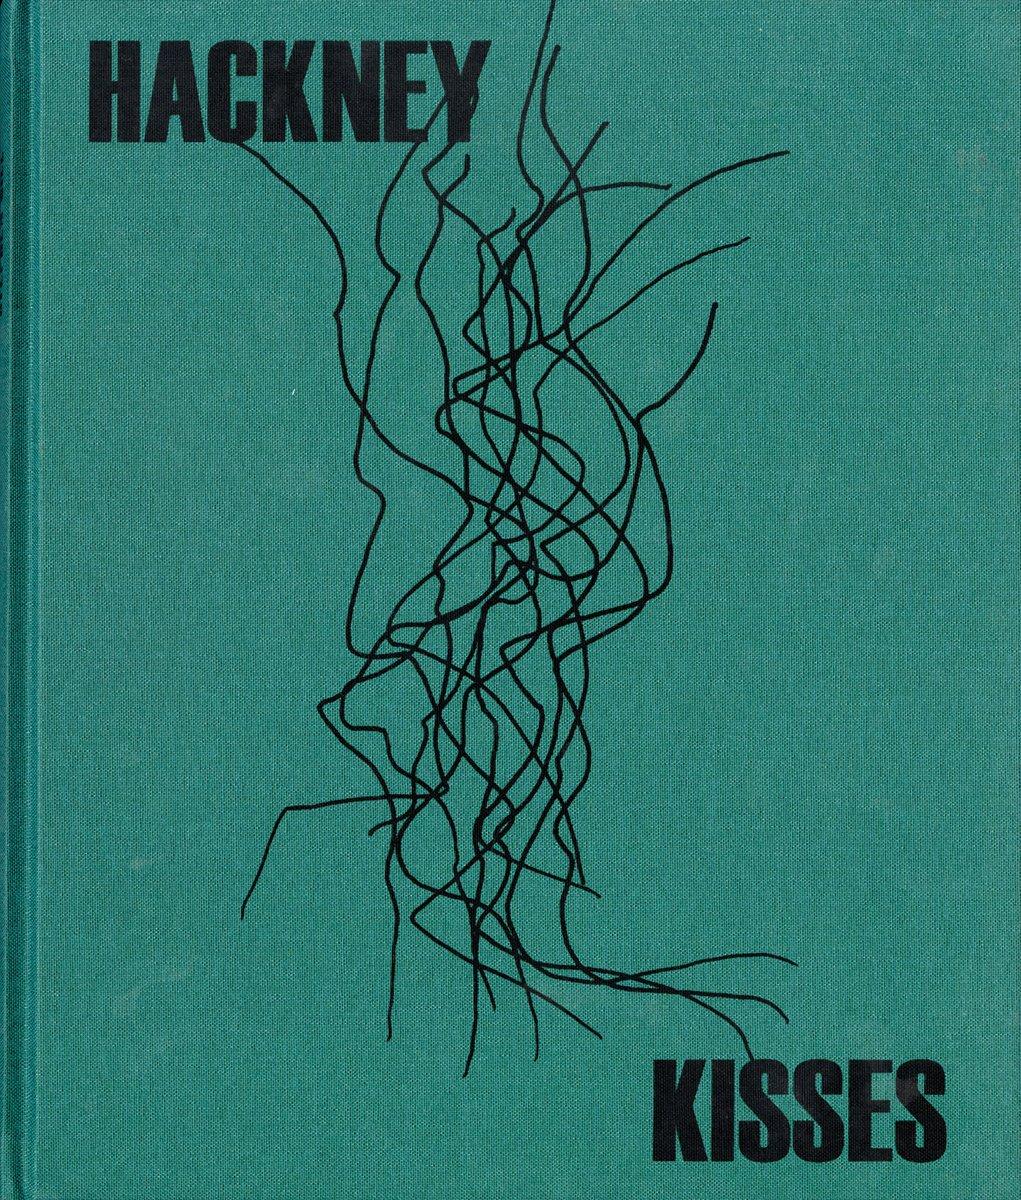 stephen-gill-hackney-kisses